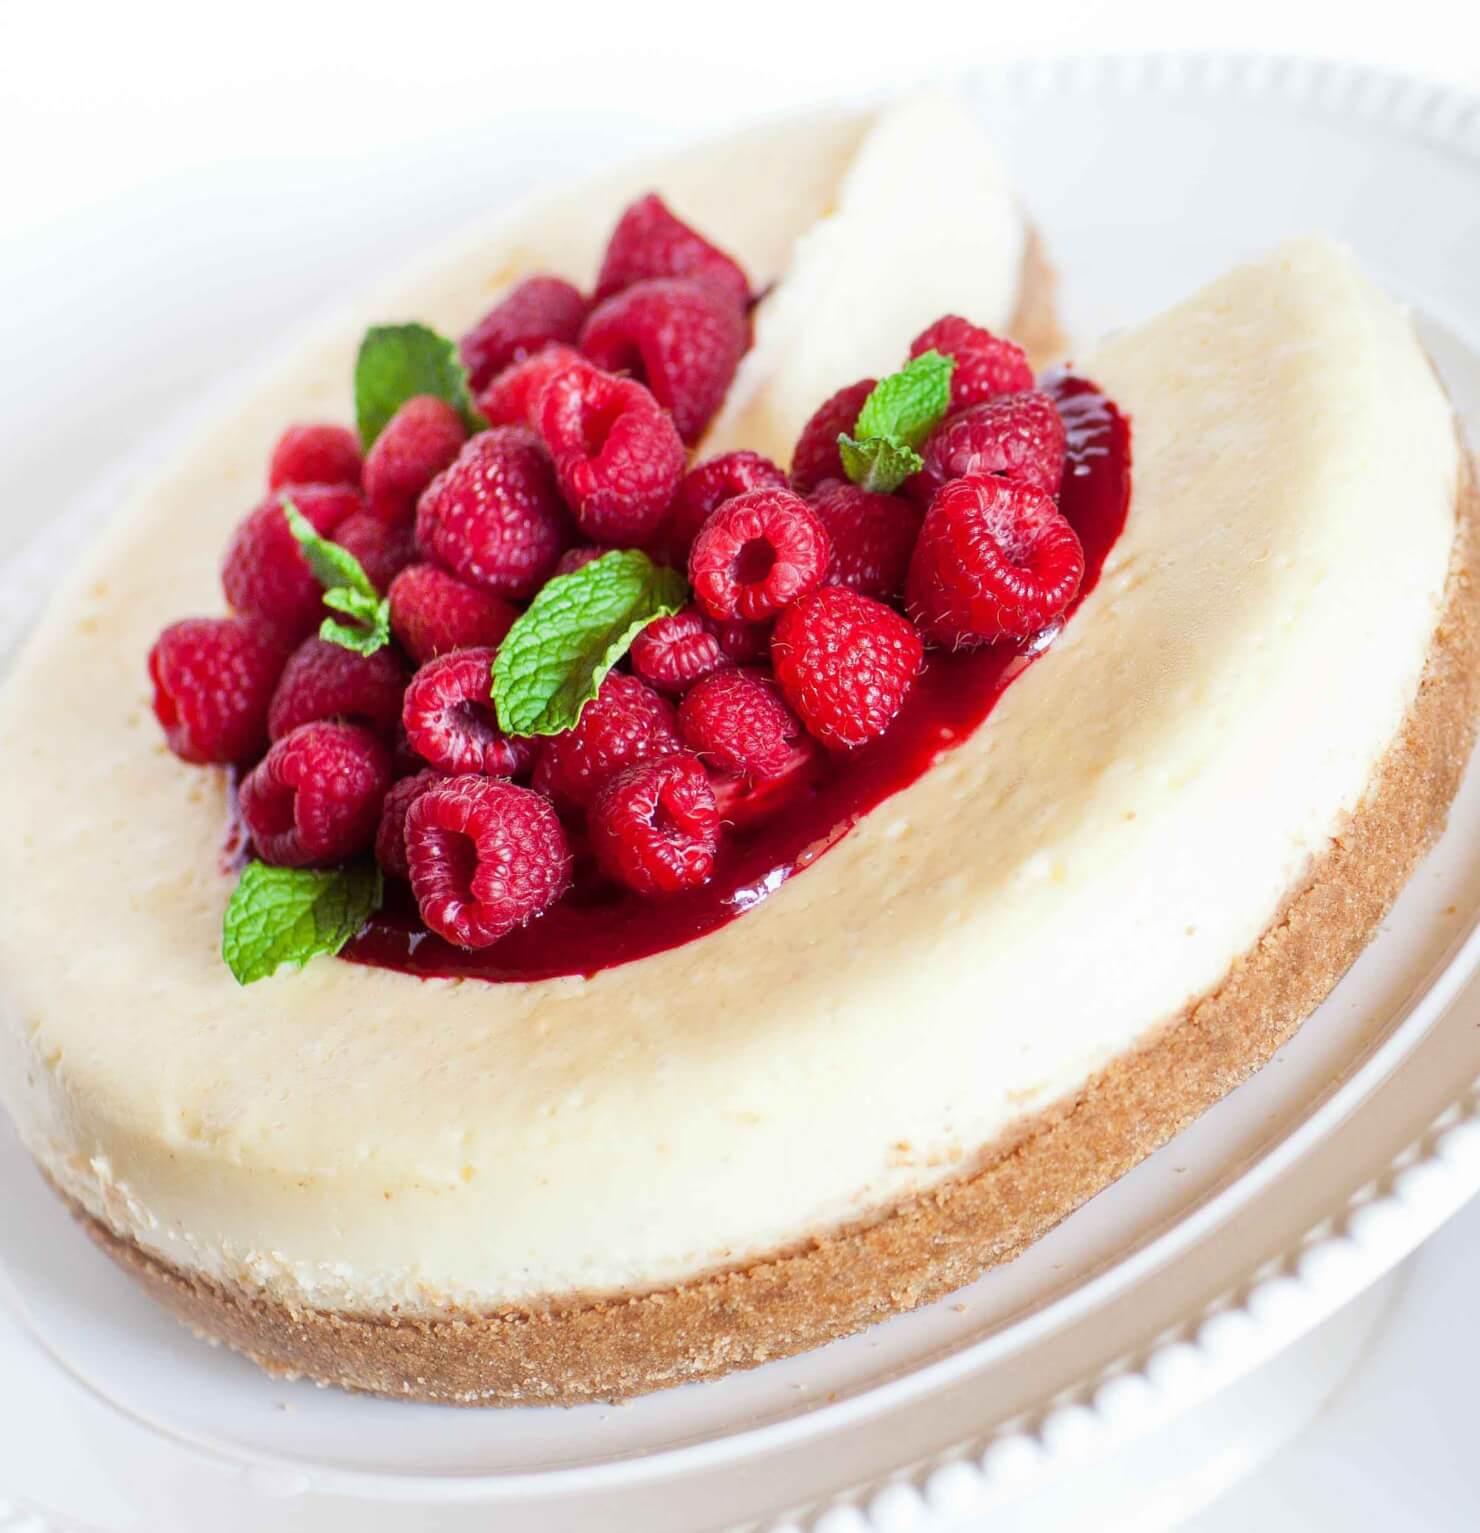 classic cheesecake with raspberries